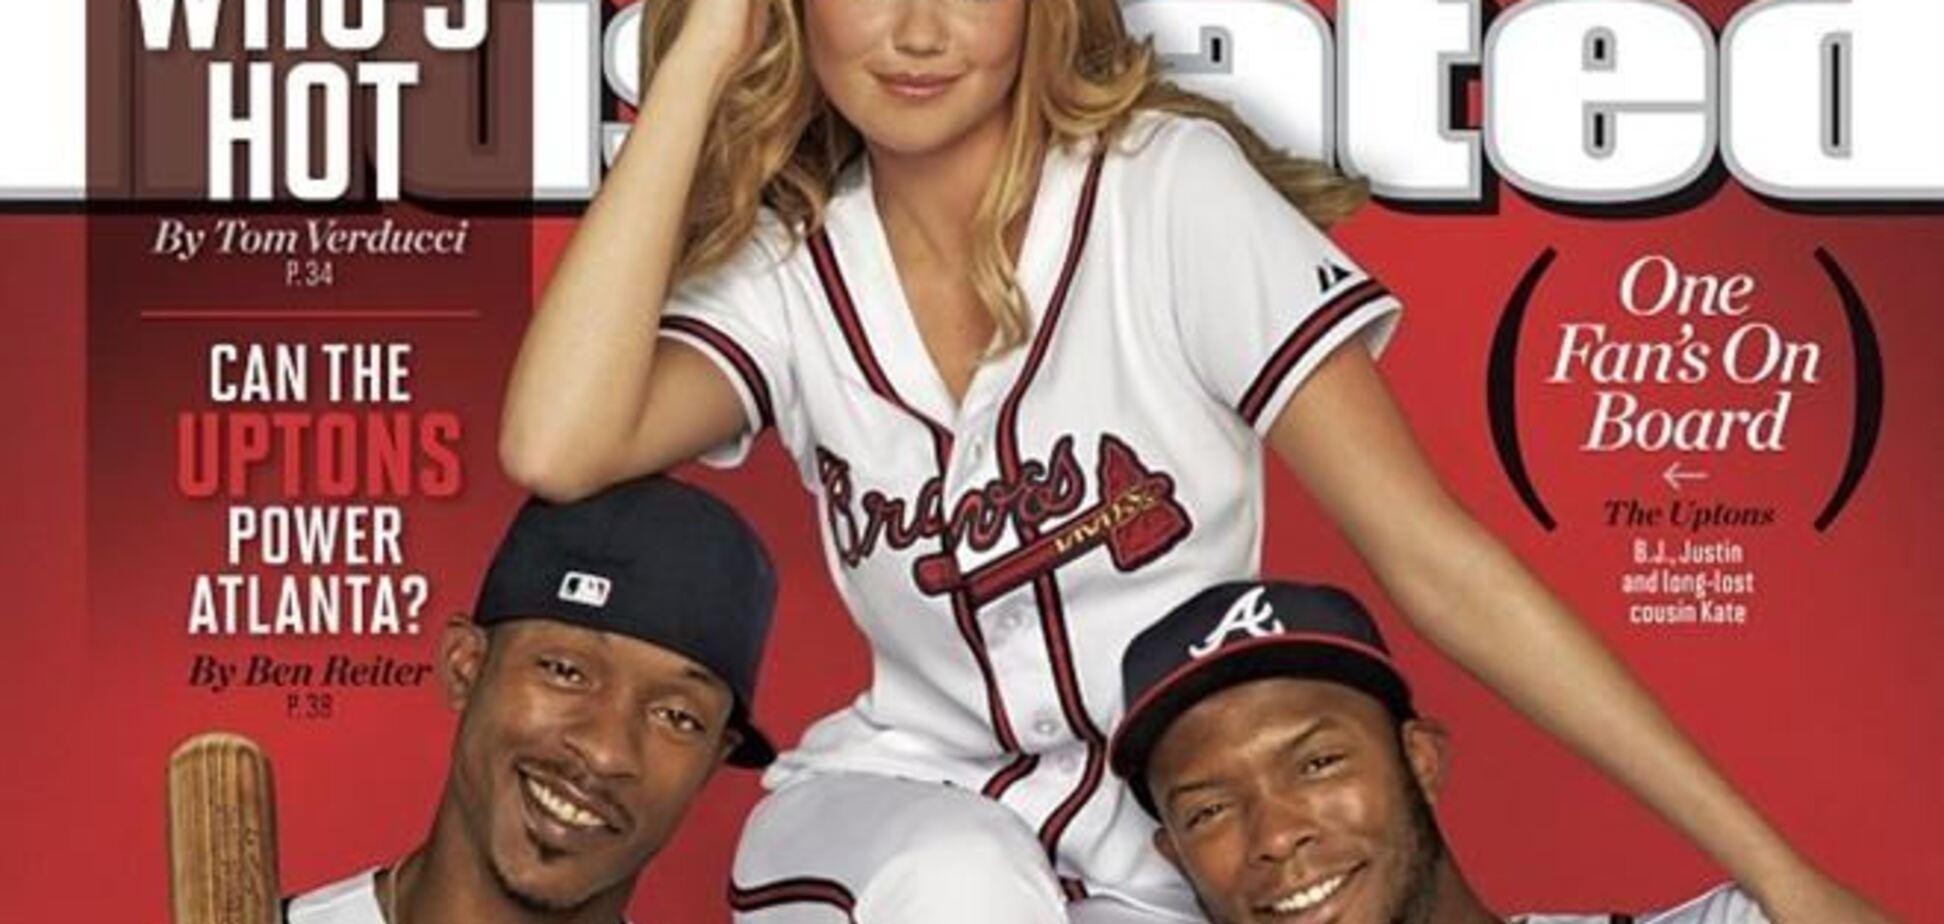 Кейт Аптон позирует со звездами бейсбола на страницах Sports Illustrated